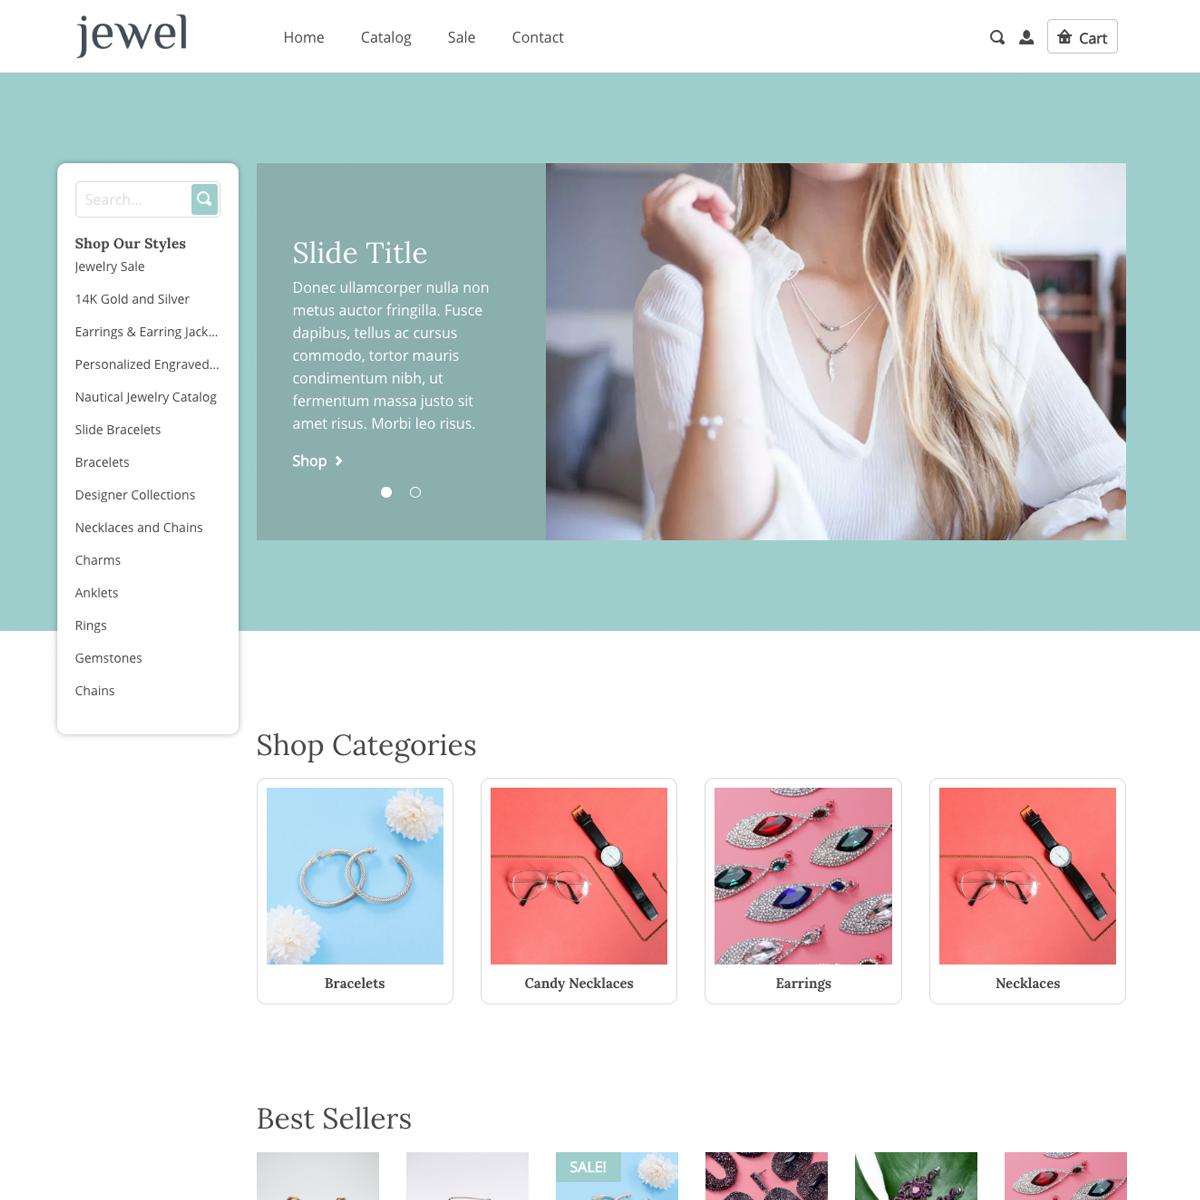 Jewel - Desktop